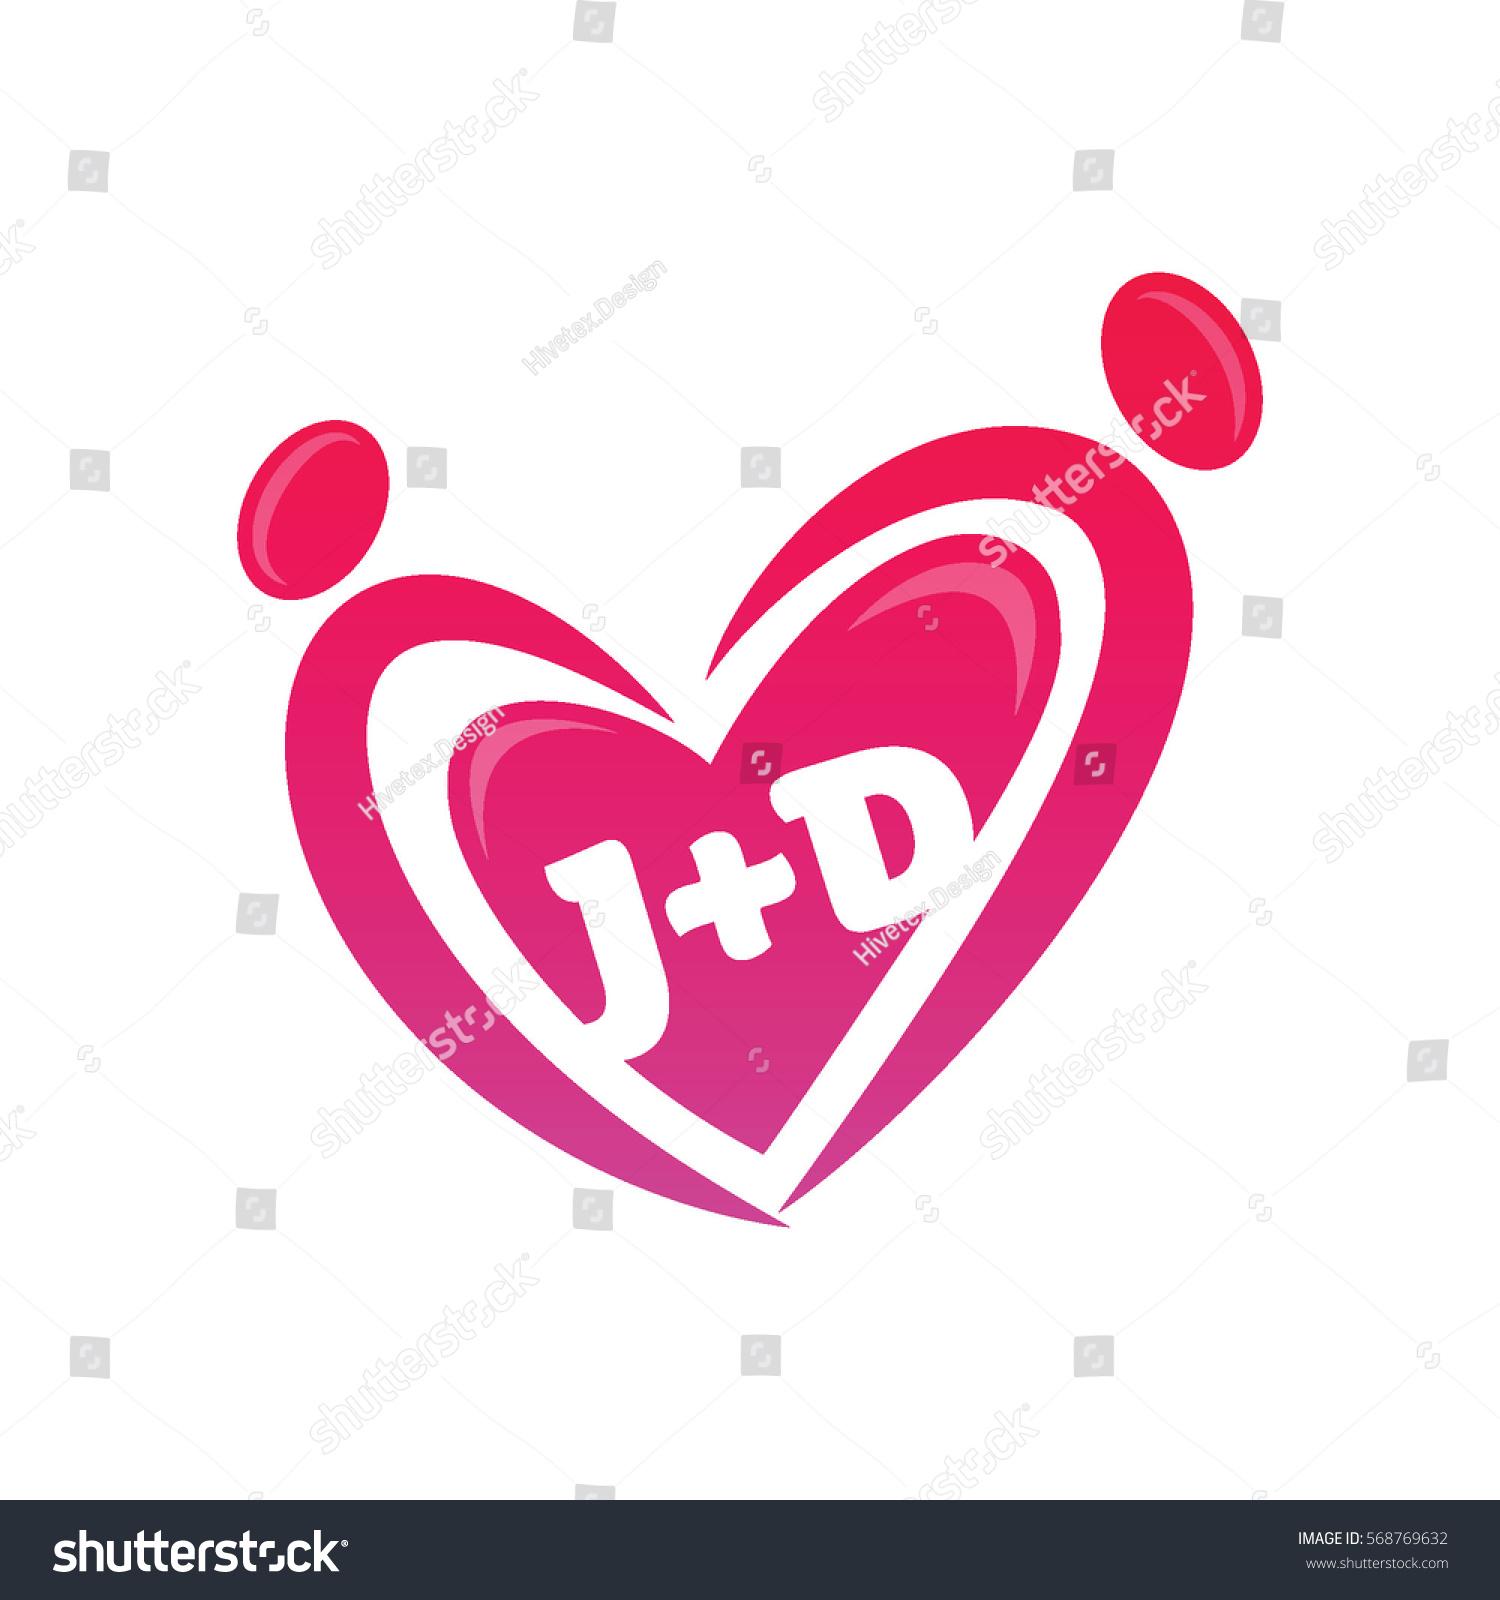 jd logo stock vector royalty free 568769632 https www shutterstock com image vector jd logo 568769632